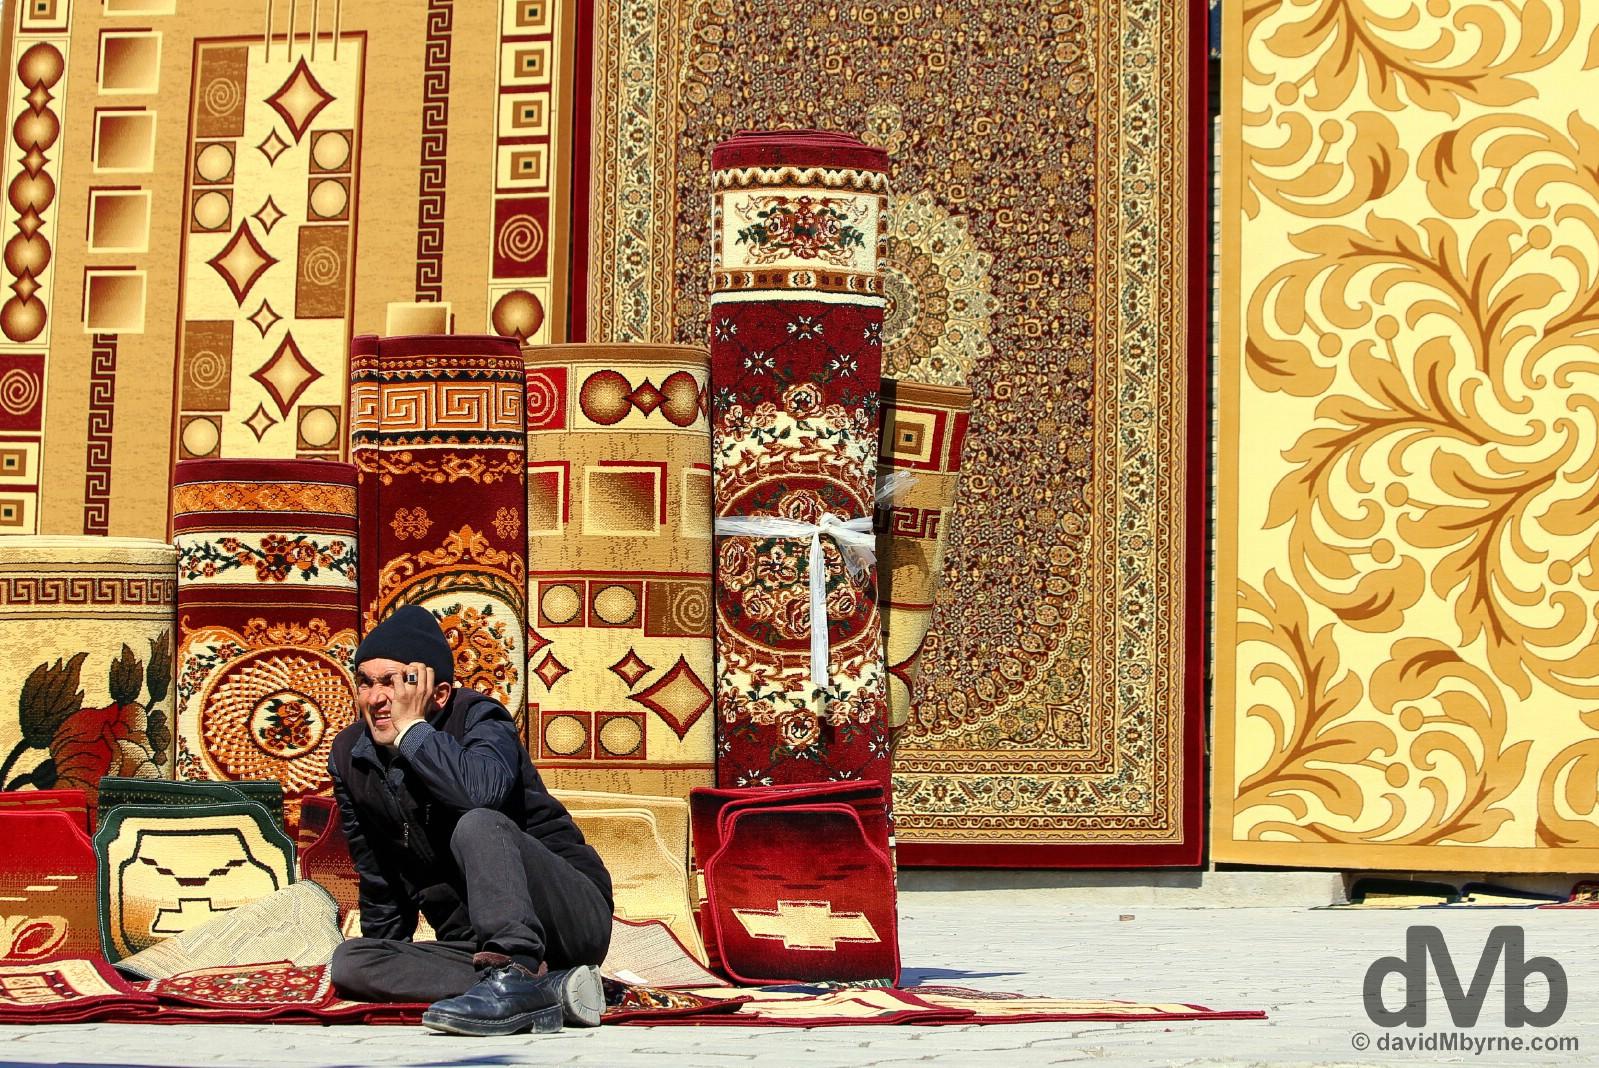 Shahriston Market, Bukhara, Uzbekistan. March 11, 2015.